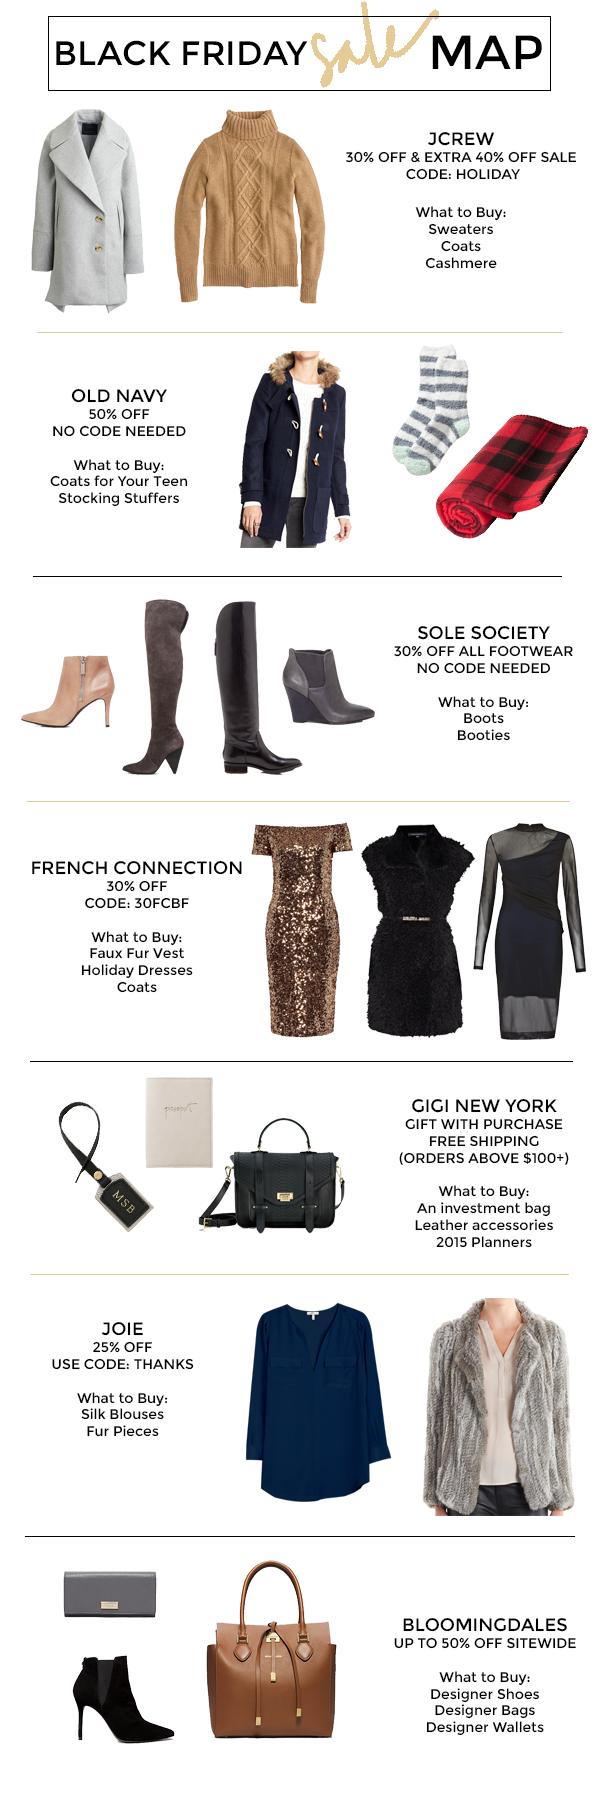 Best Black Friday Sales 2014